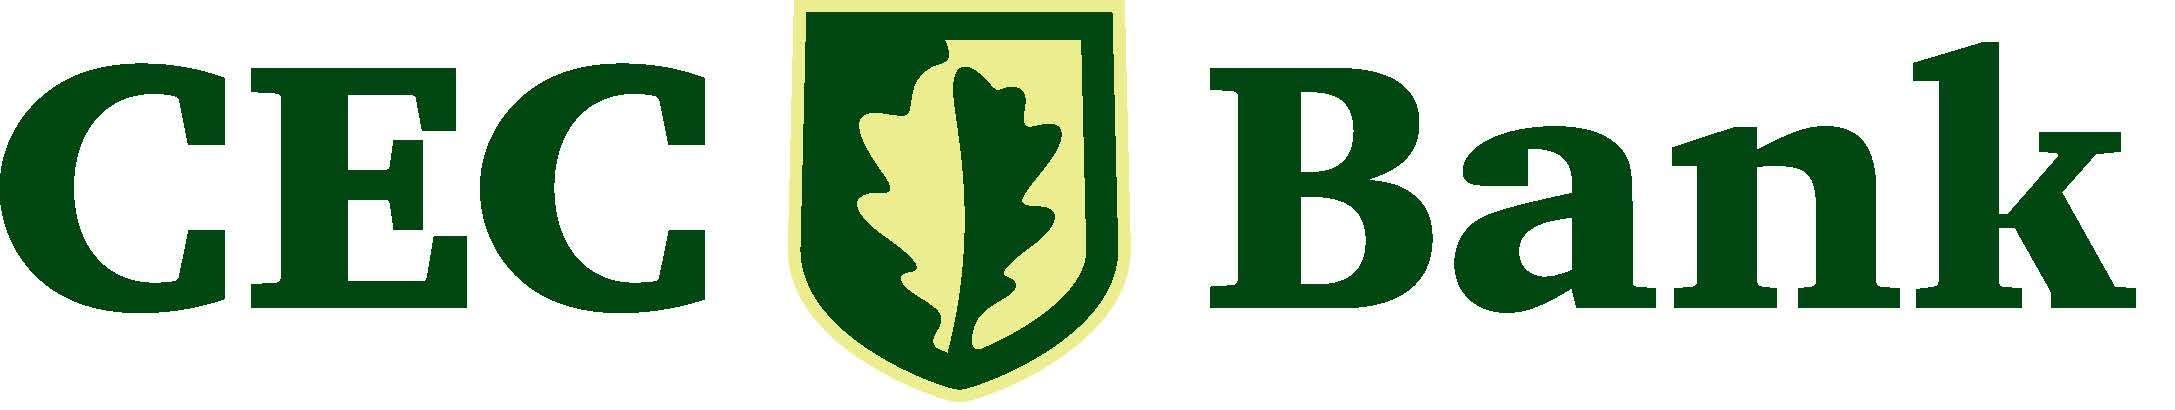 CEC Bank logo[4615]